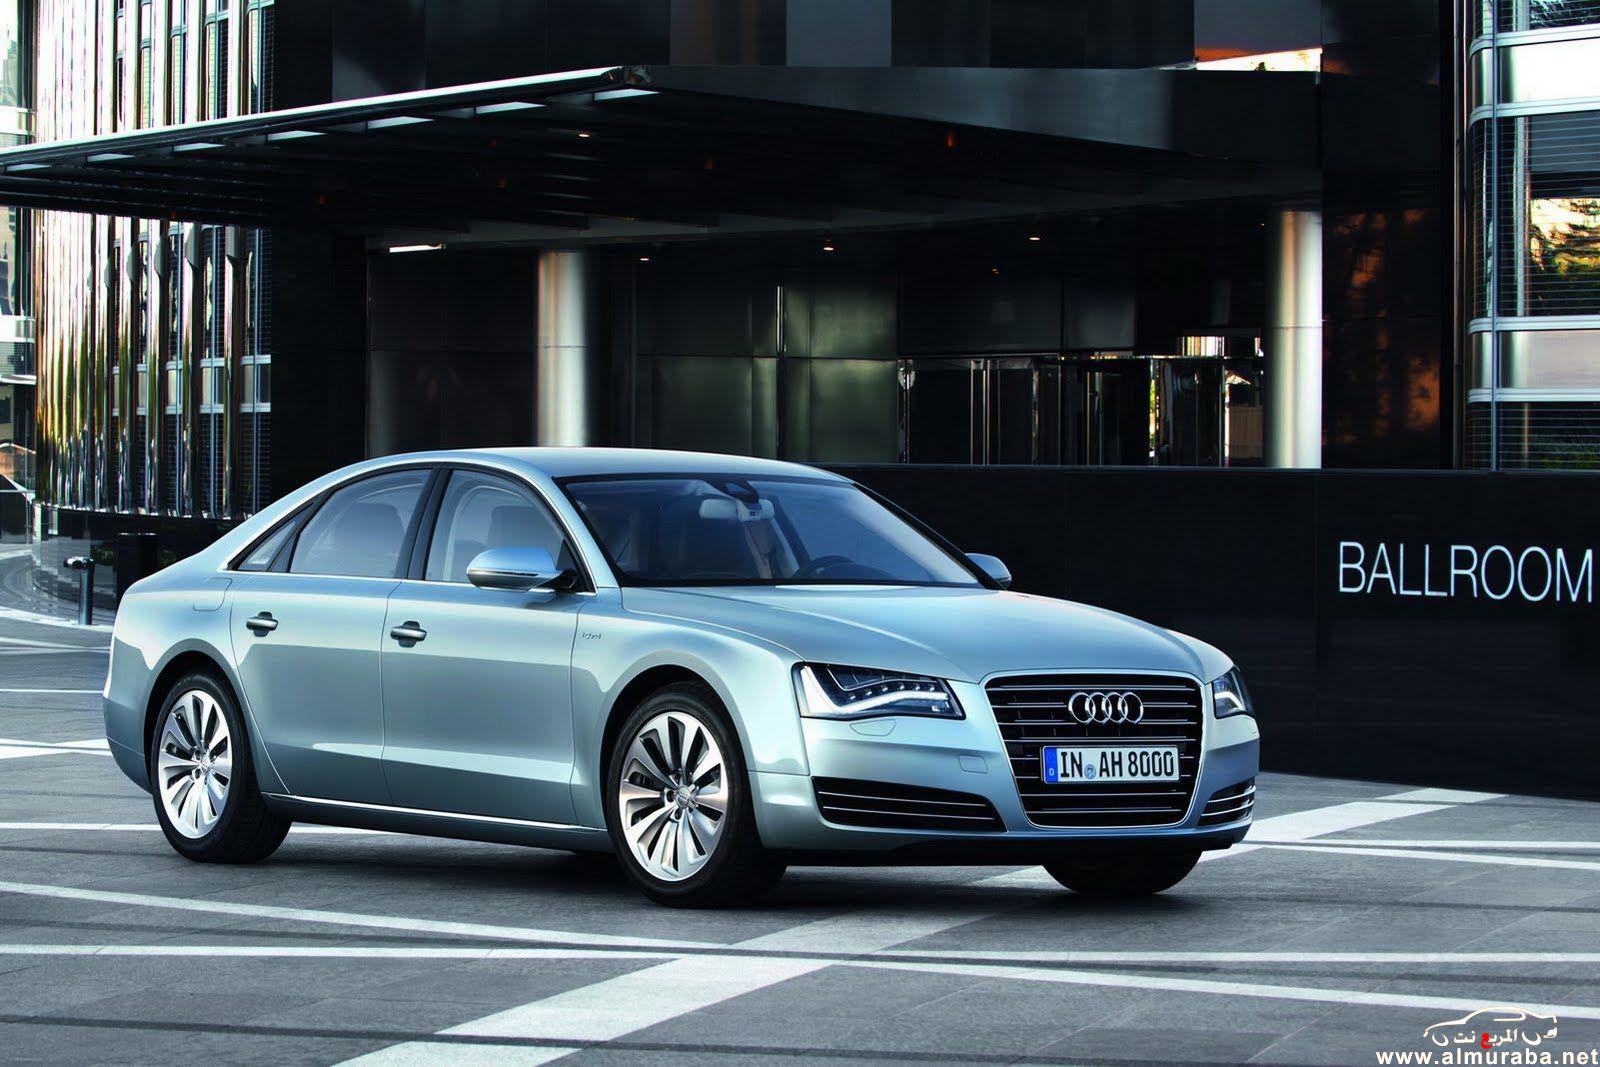 Kekurangan Audi 2012 Tangguh